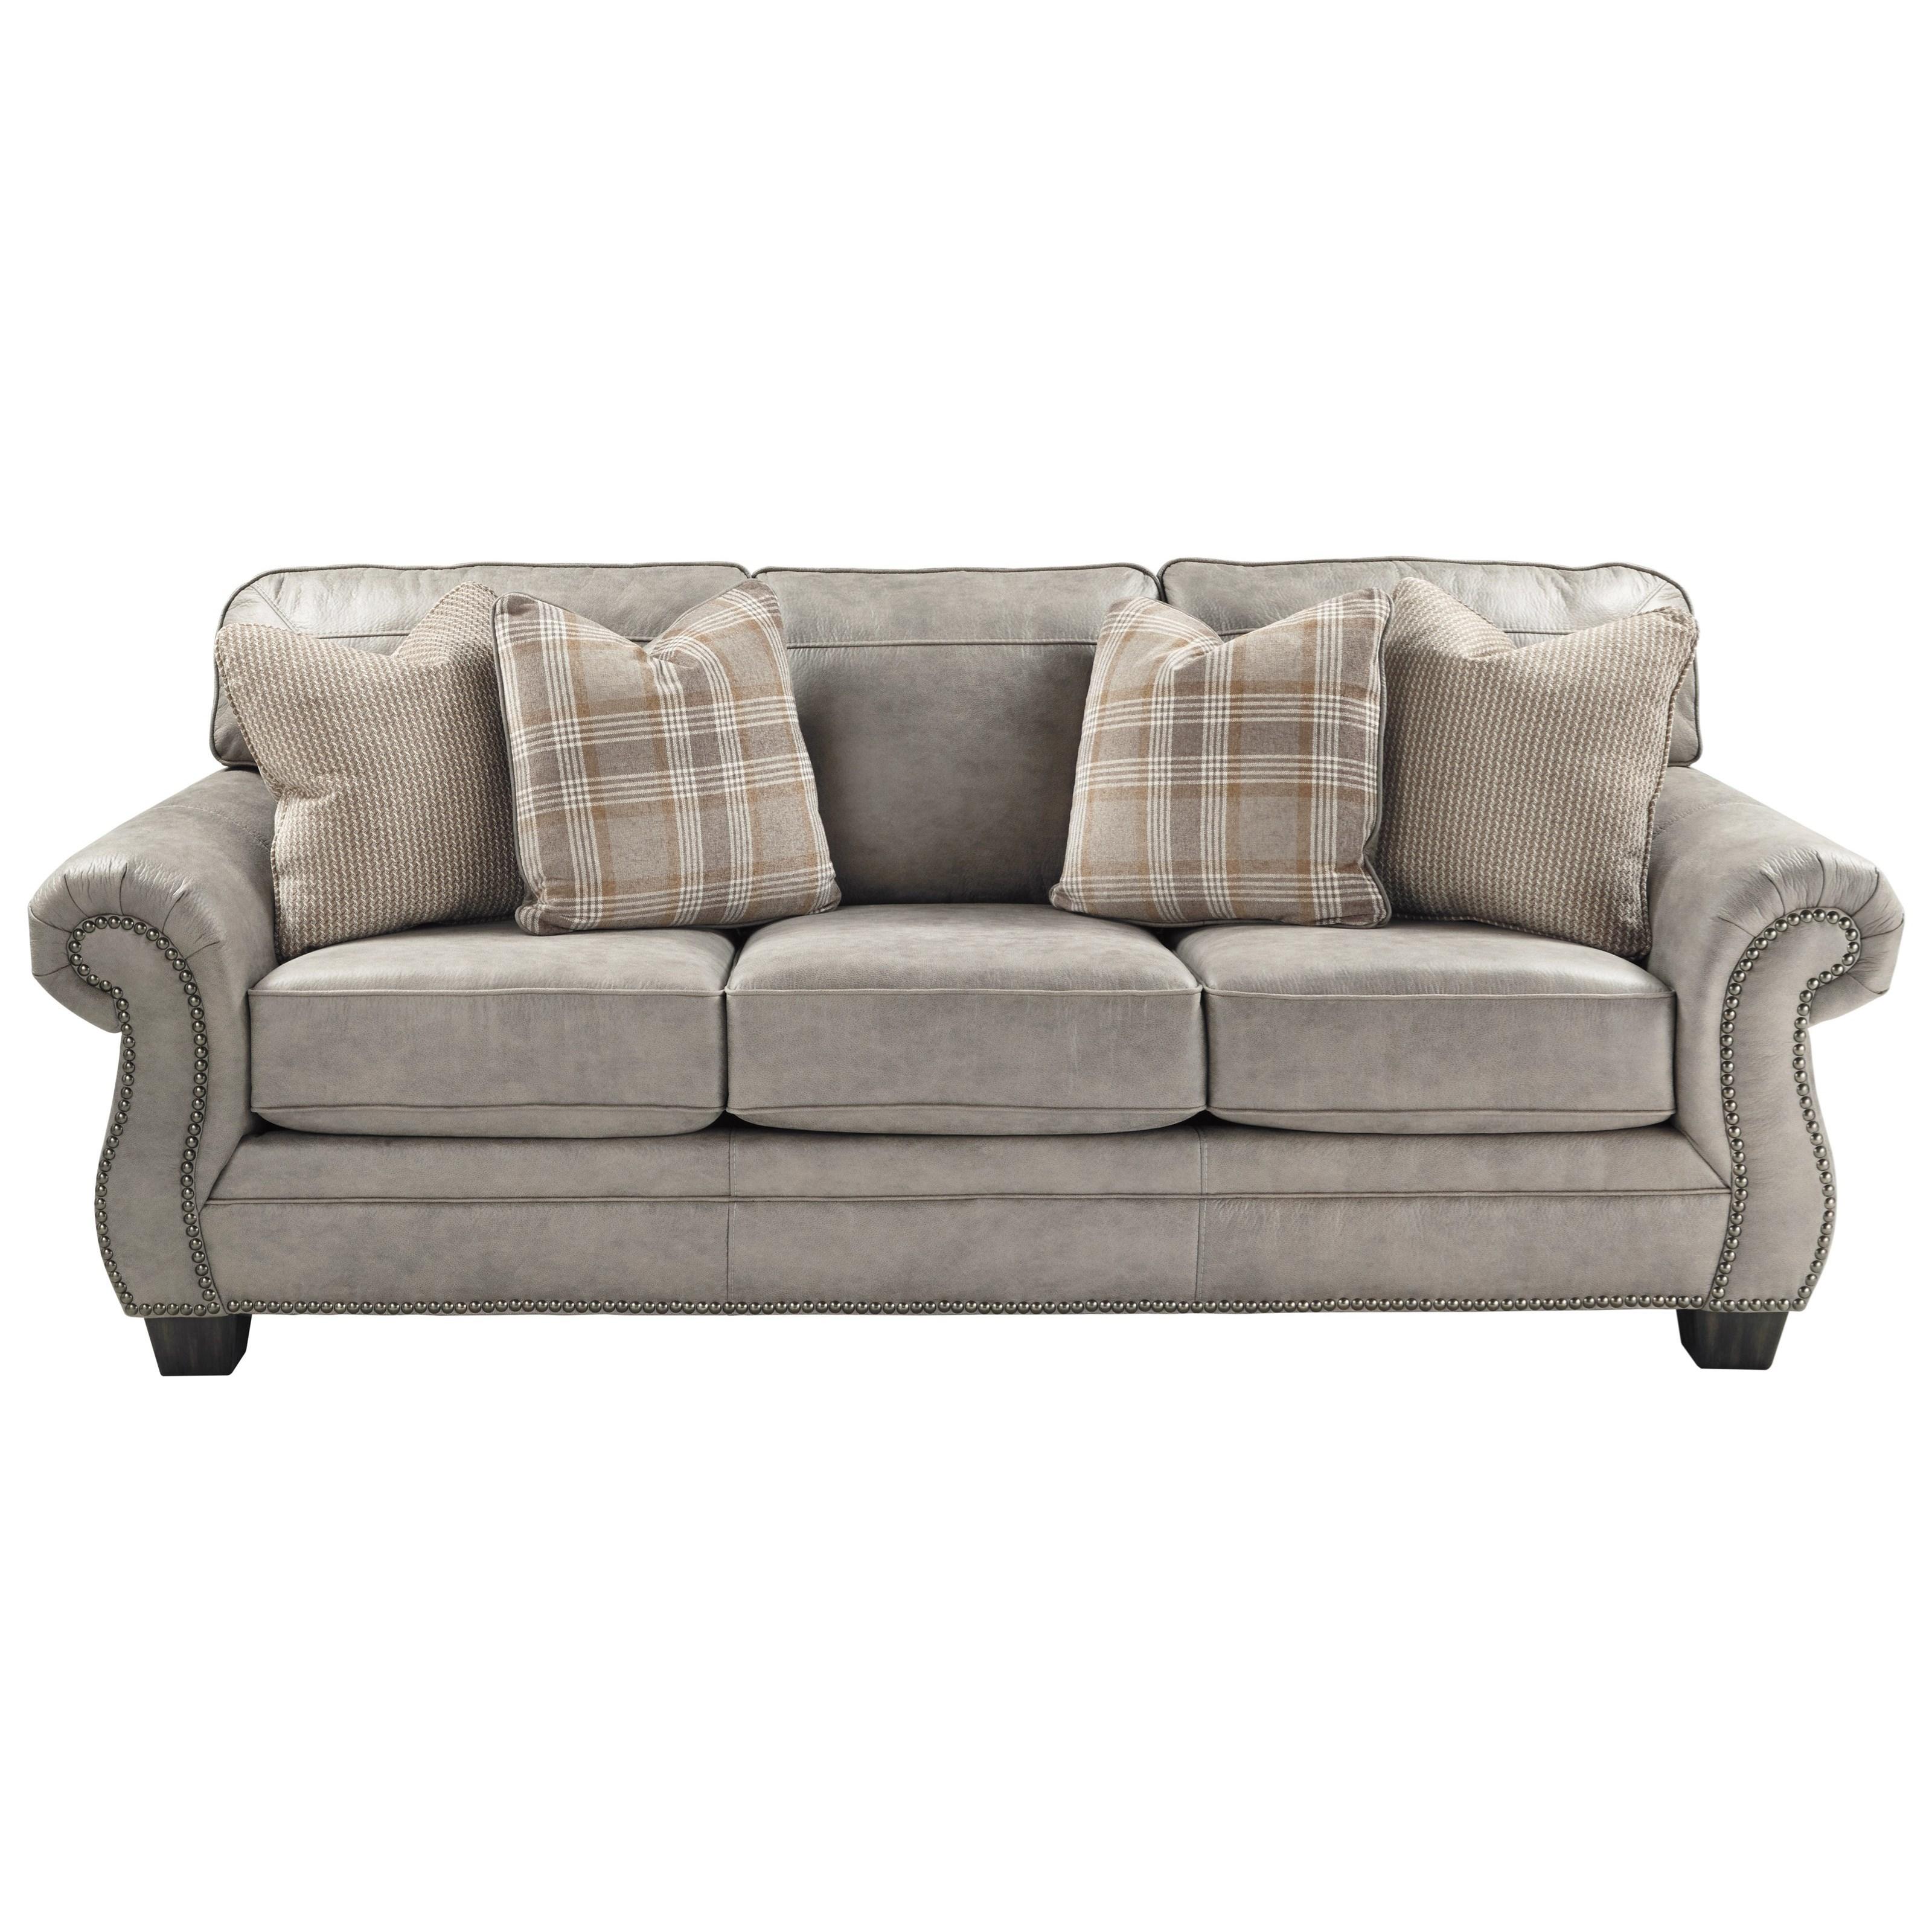 Signature Design By Ashley Olsberg Transitional Sofa With Nailhead Trim